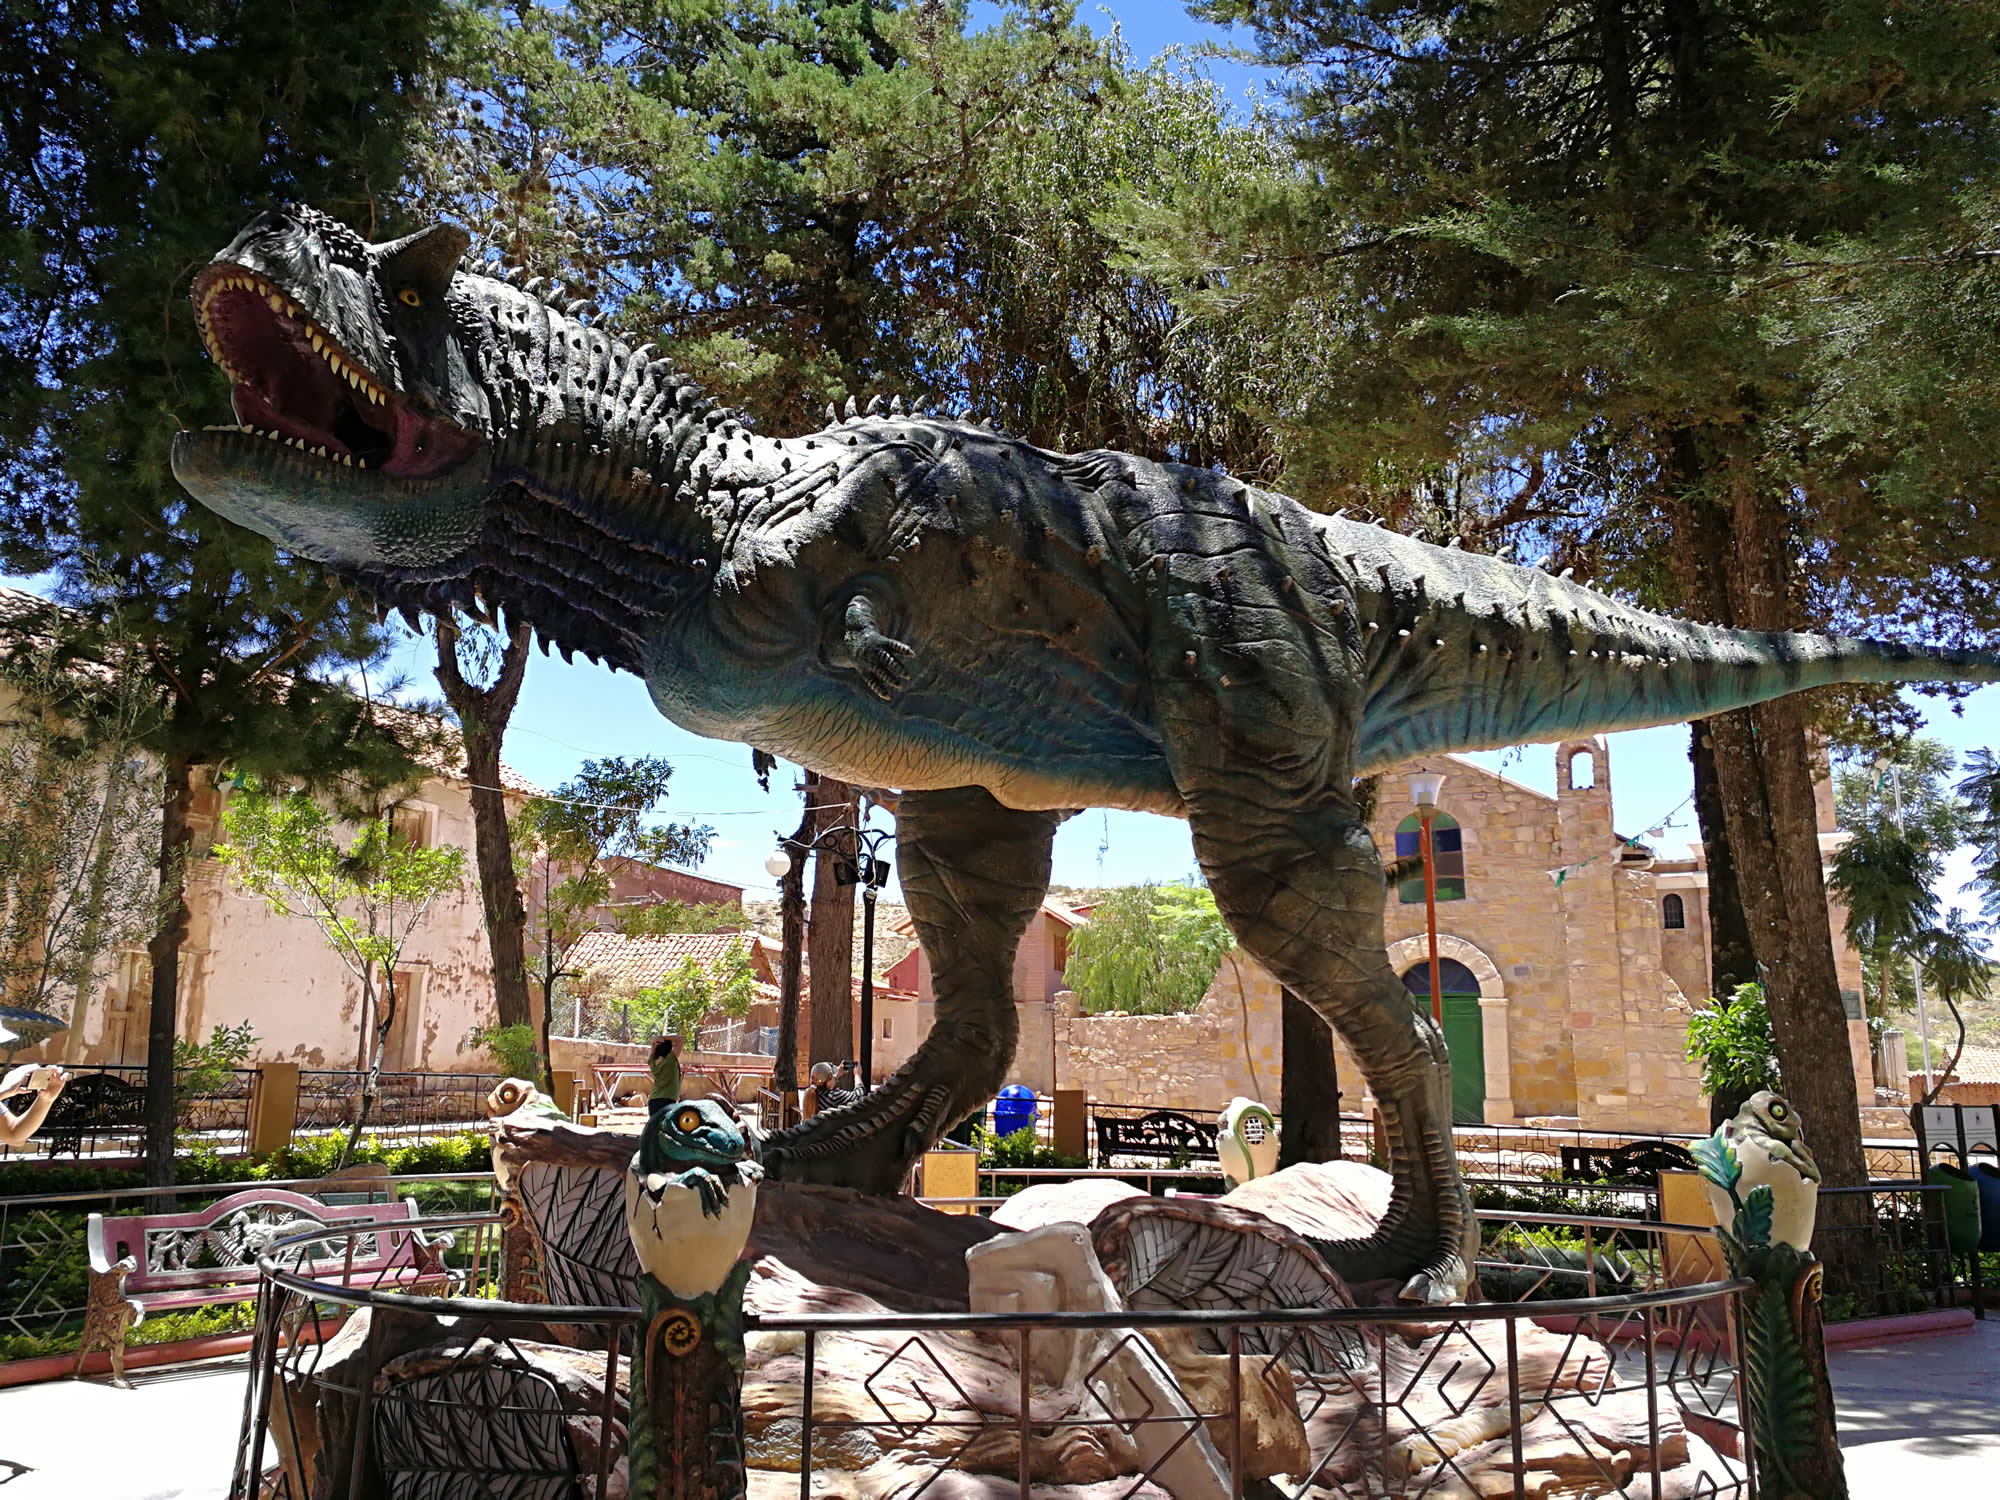 Torotoro Dinosaurs